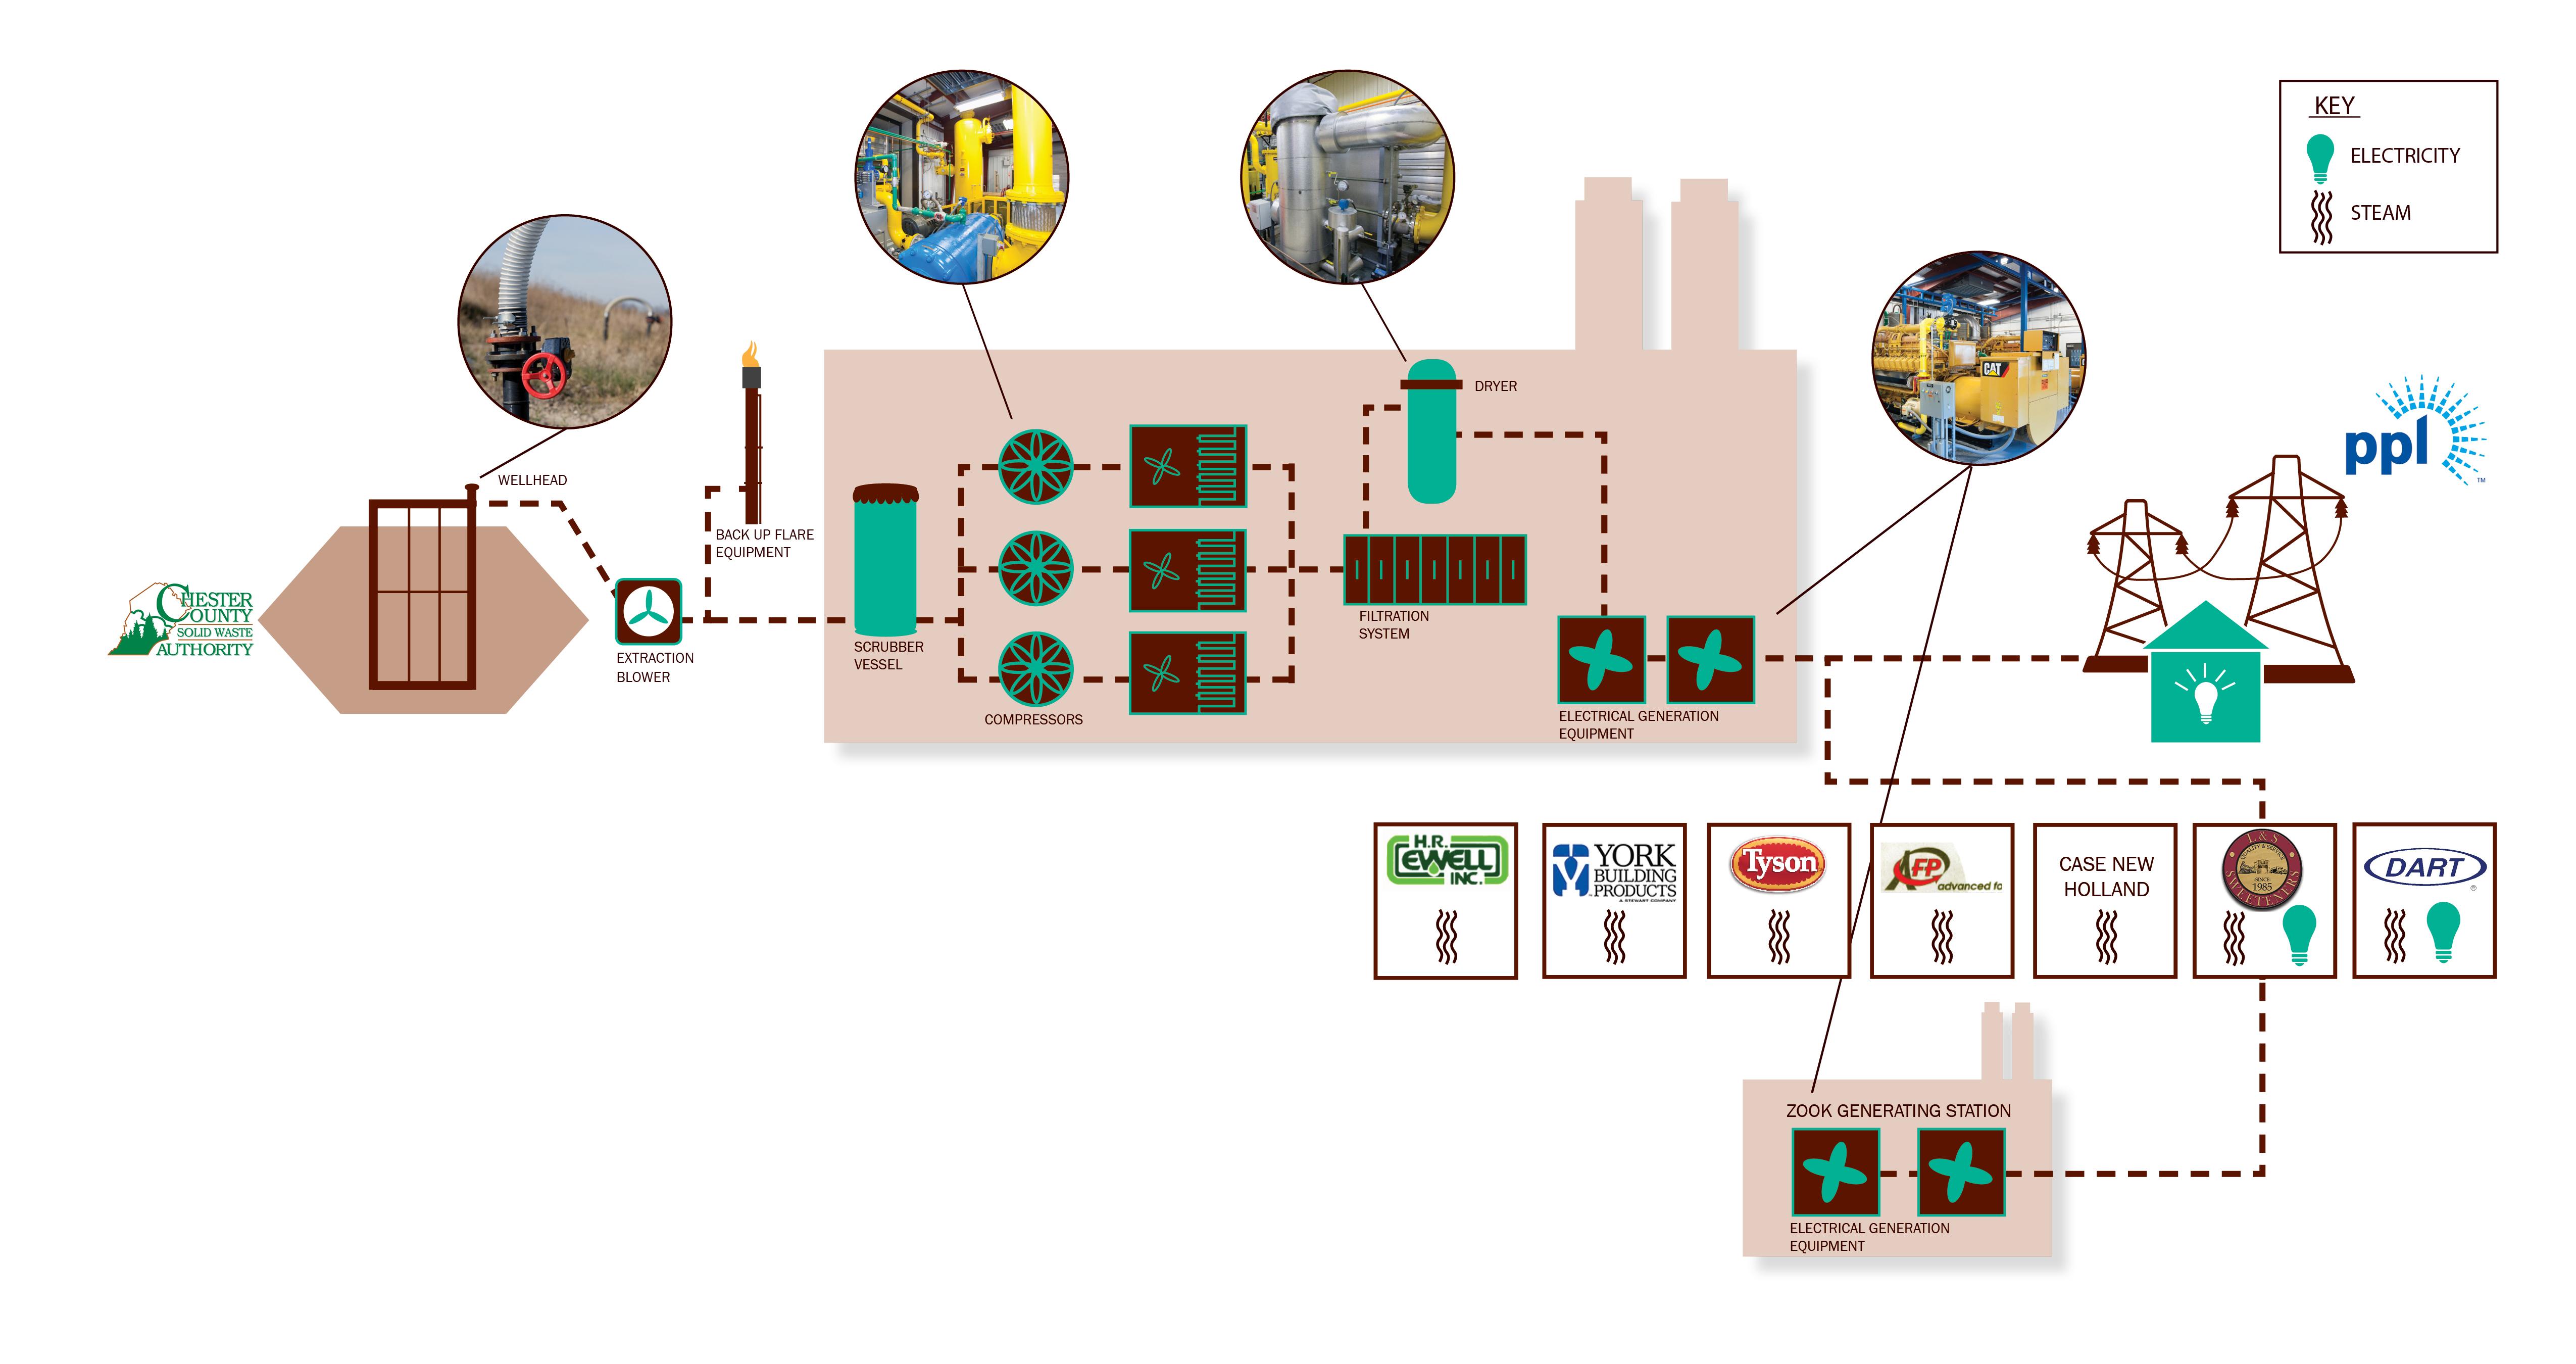 Honey Brook Gas pressor & Generating Station